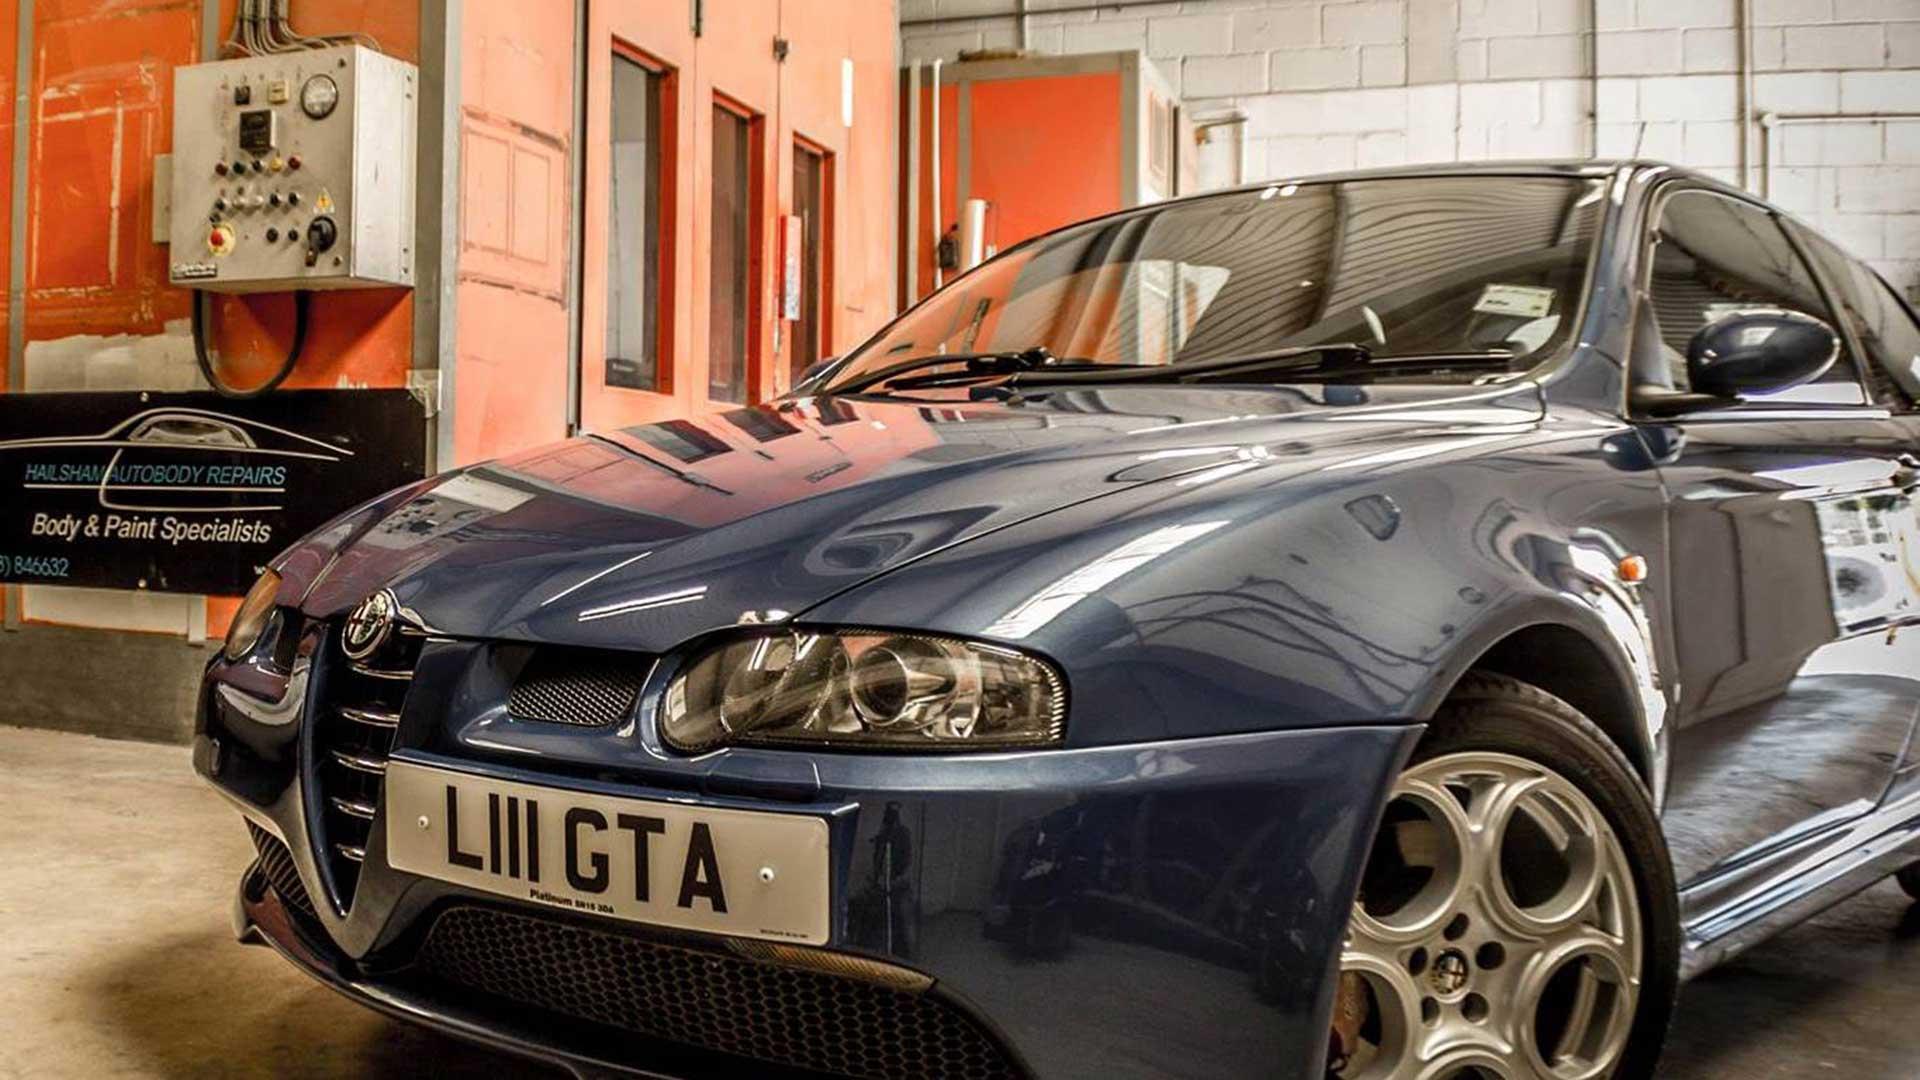 An Alfa Romeo being repaired in Hailsham Autobody's Garage